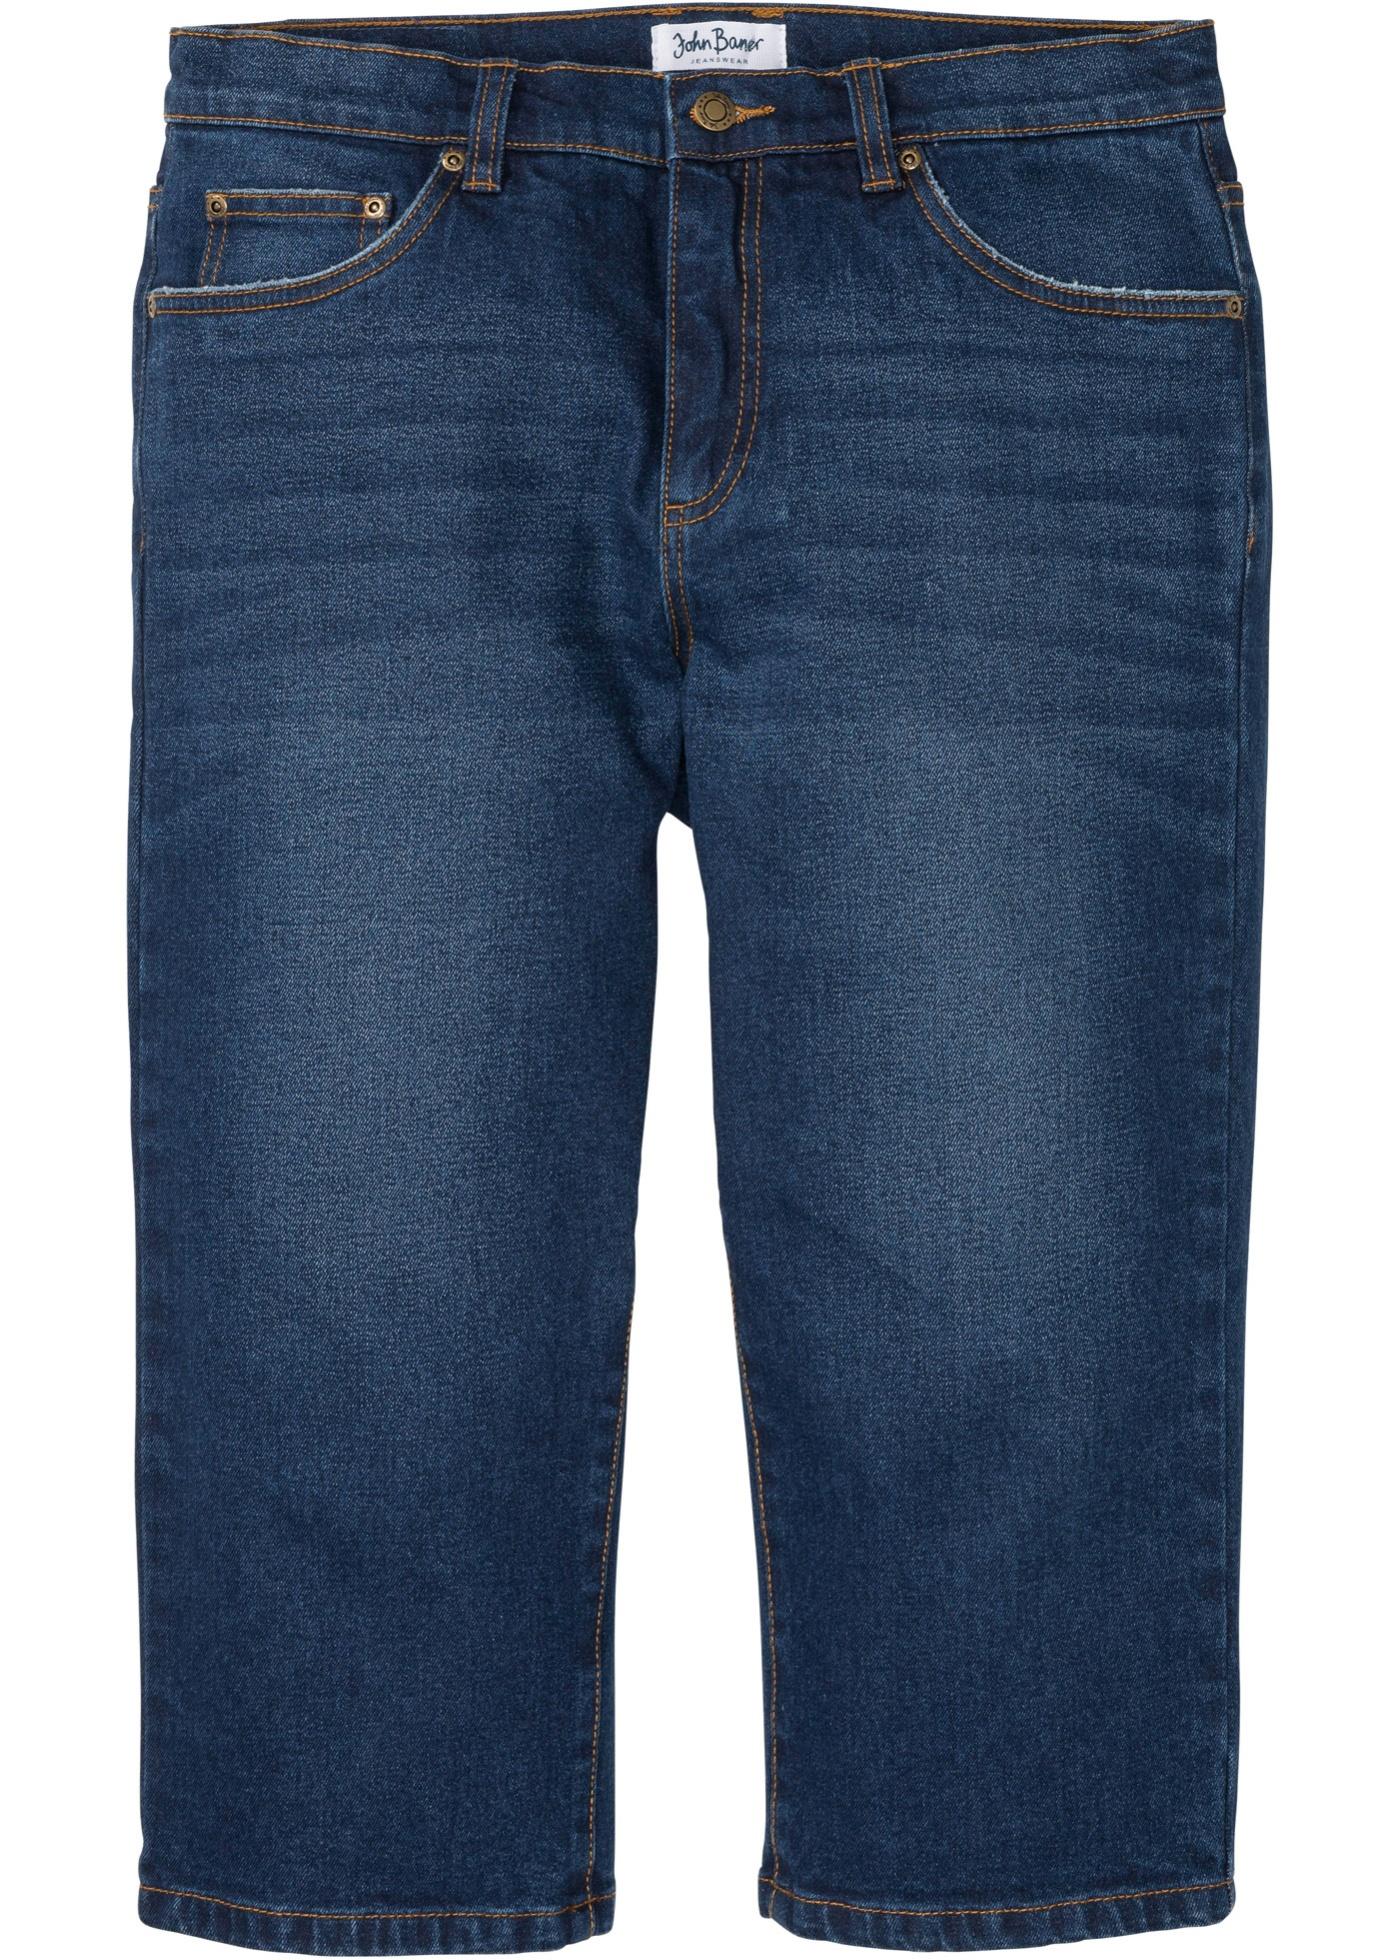 Bilde av 3/4 Classic Fit Stretch-jeans, Straight